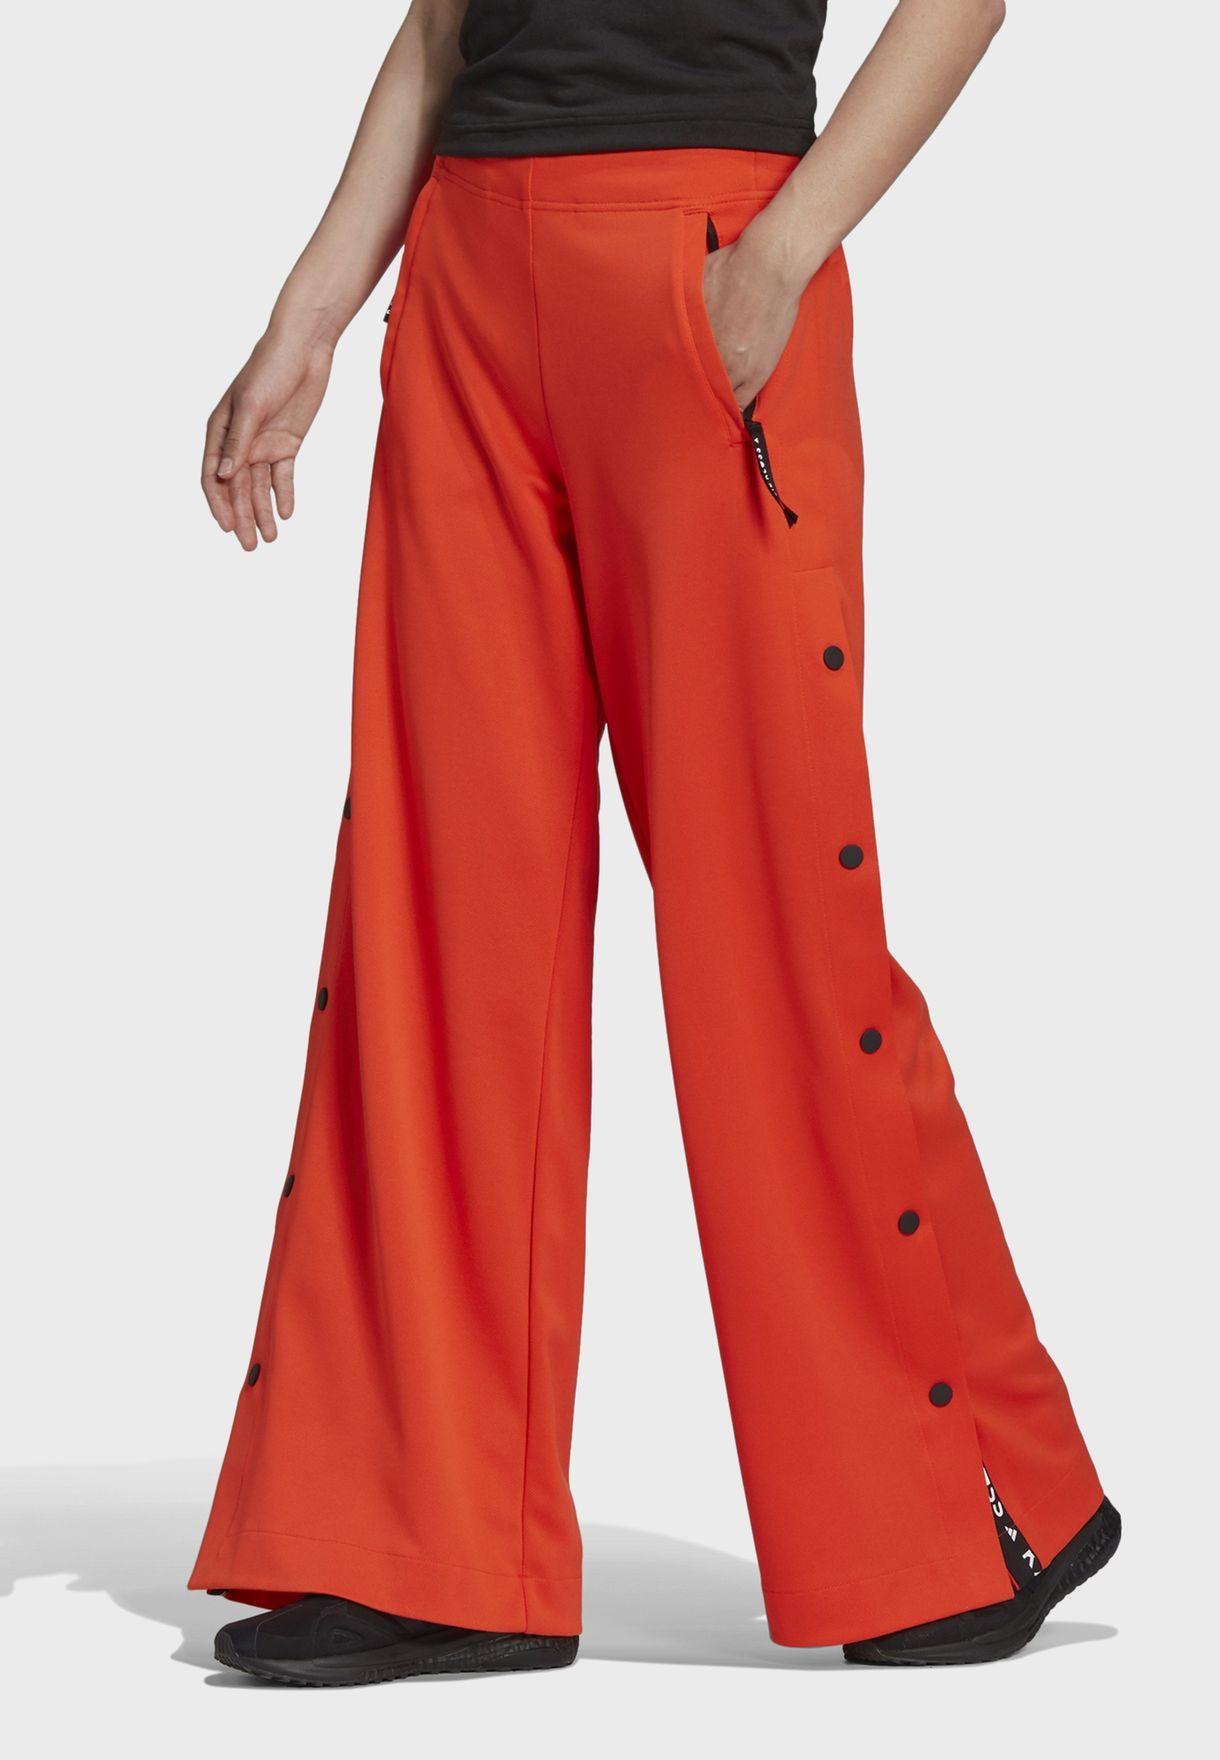 Karlie Kloss Essential Fleece Sweatpants